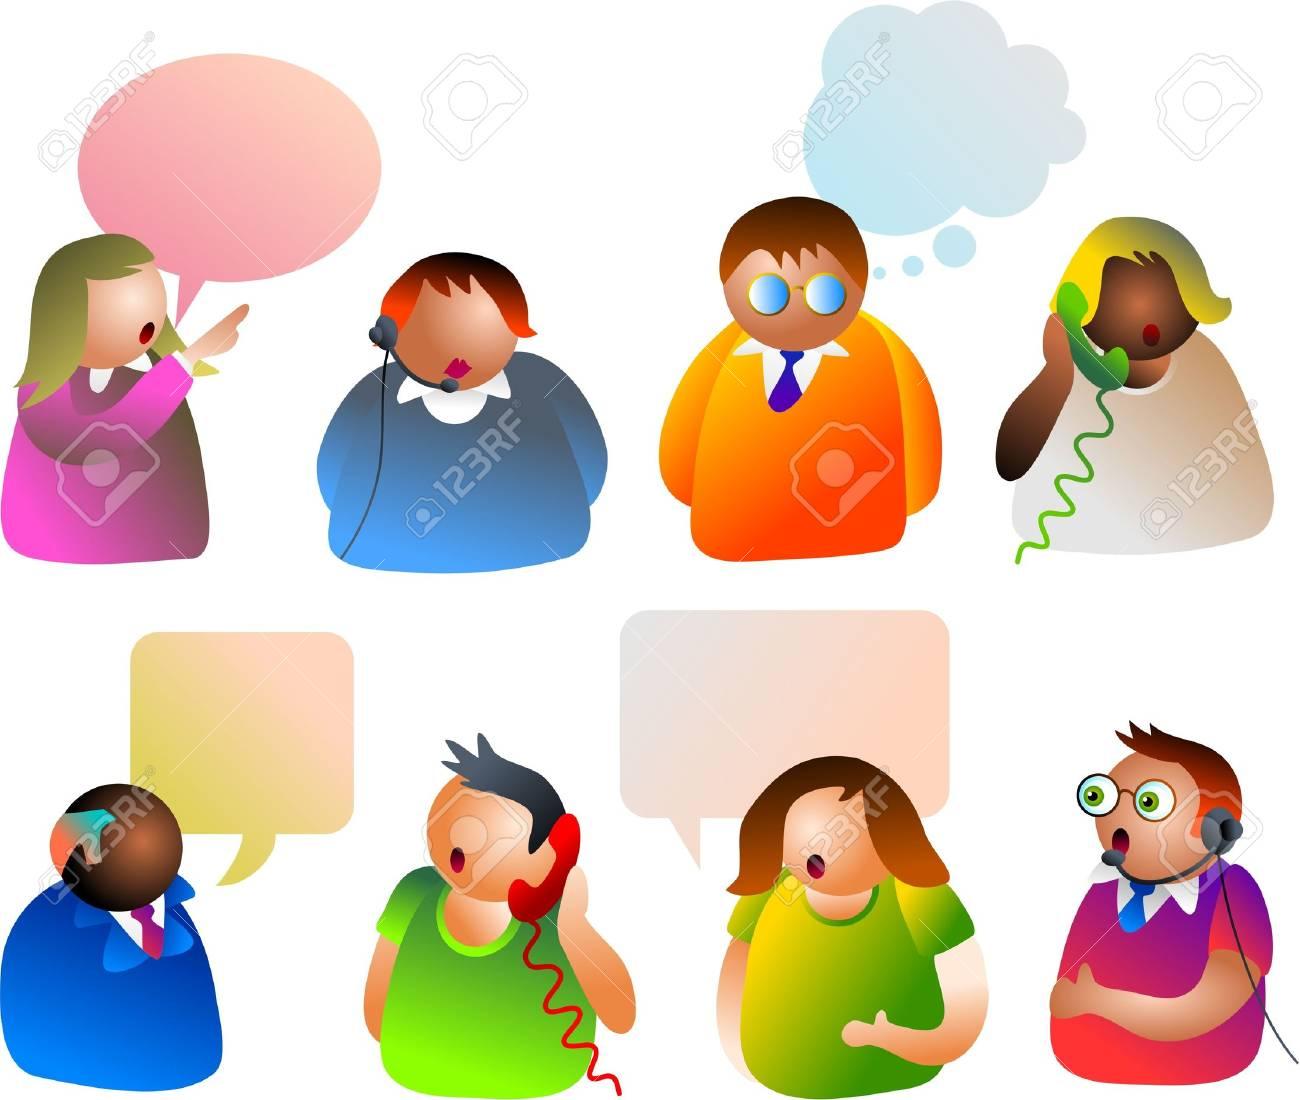 communication people icons Stock Photo - 261490